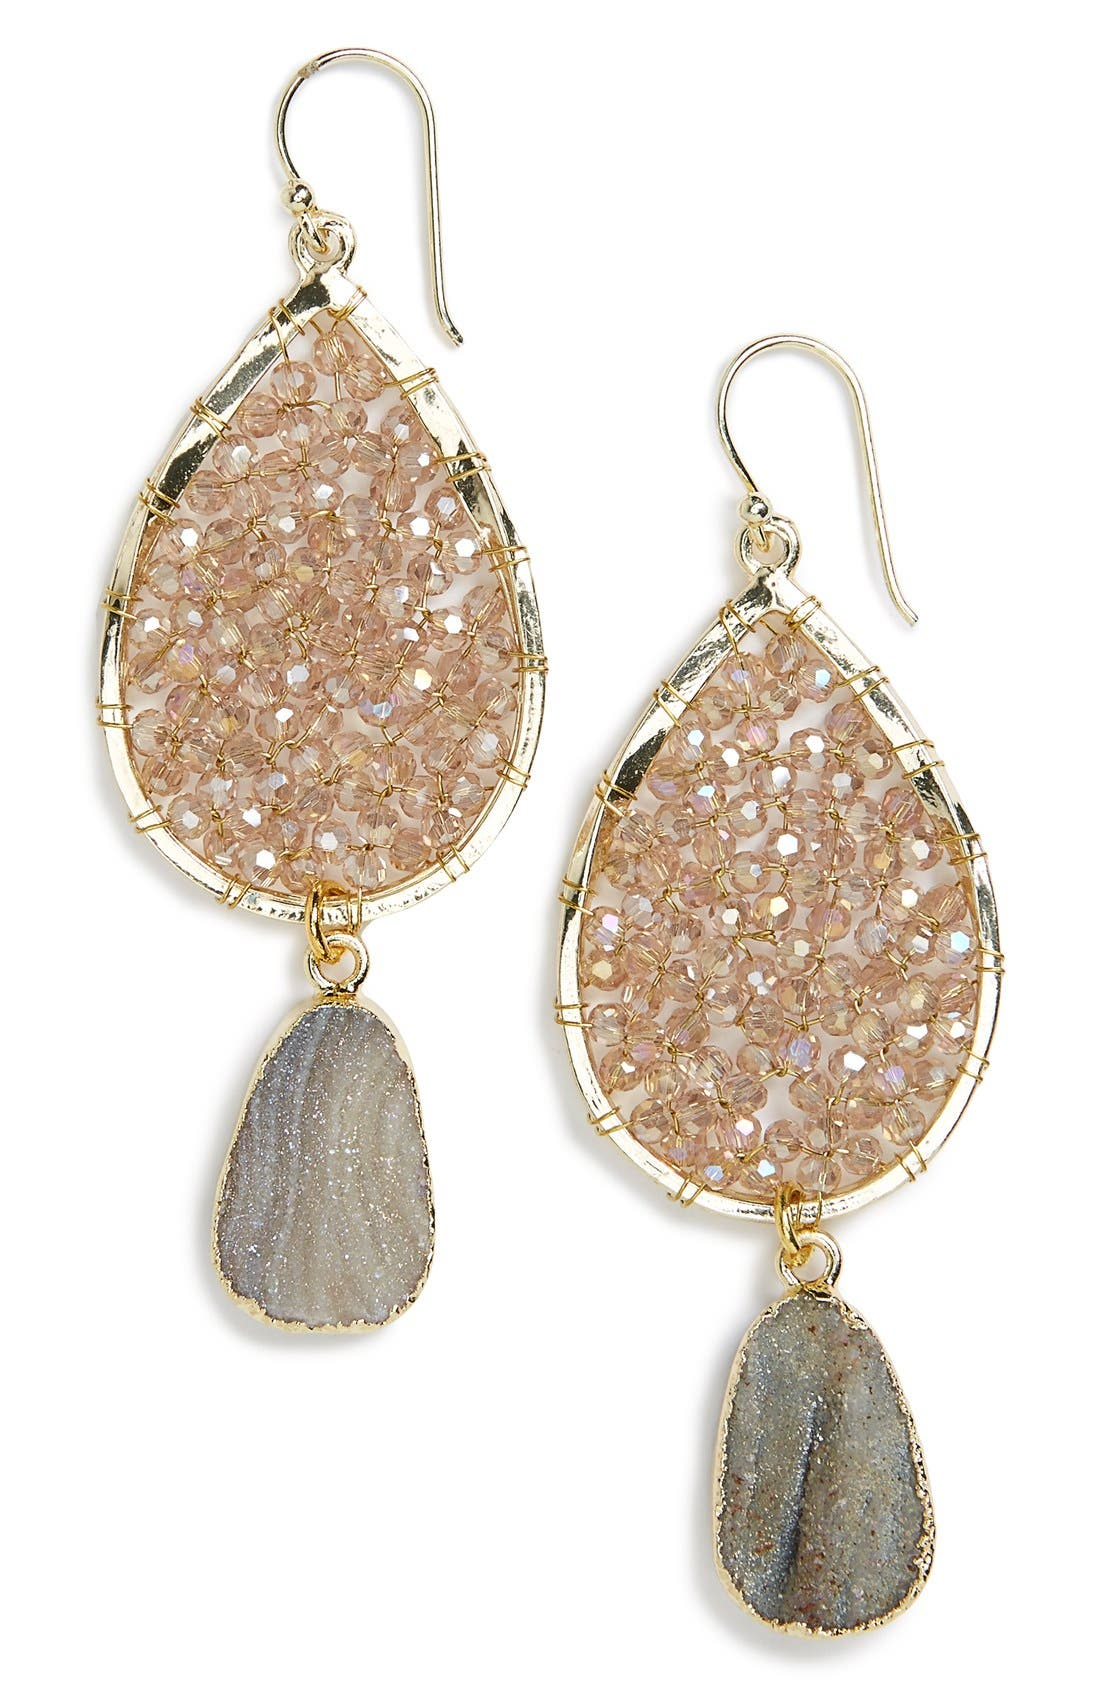 Main Image - Panacea Smoky Agate Drop Earrings